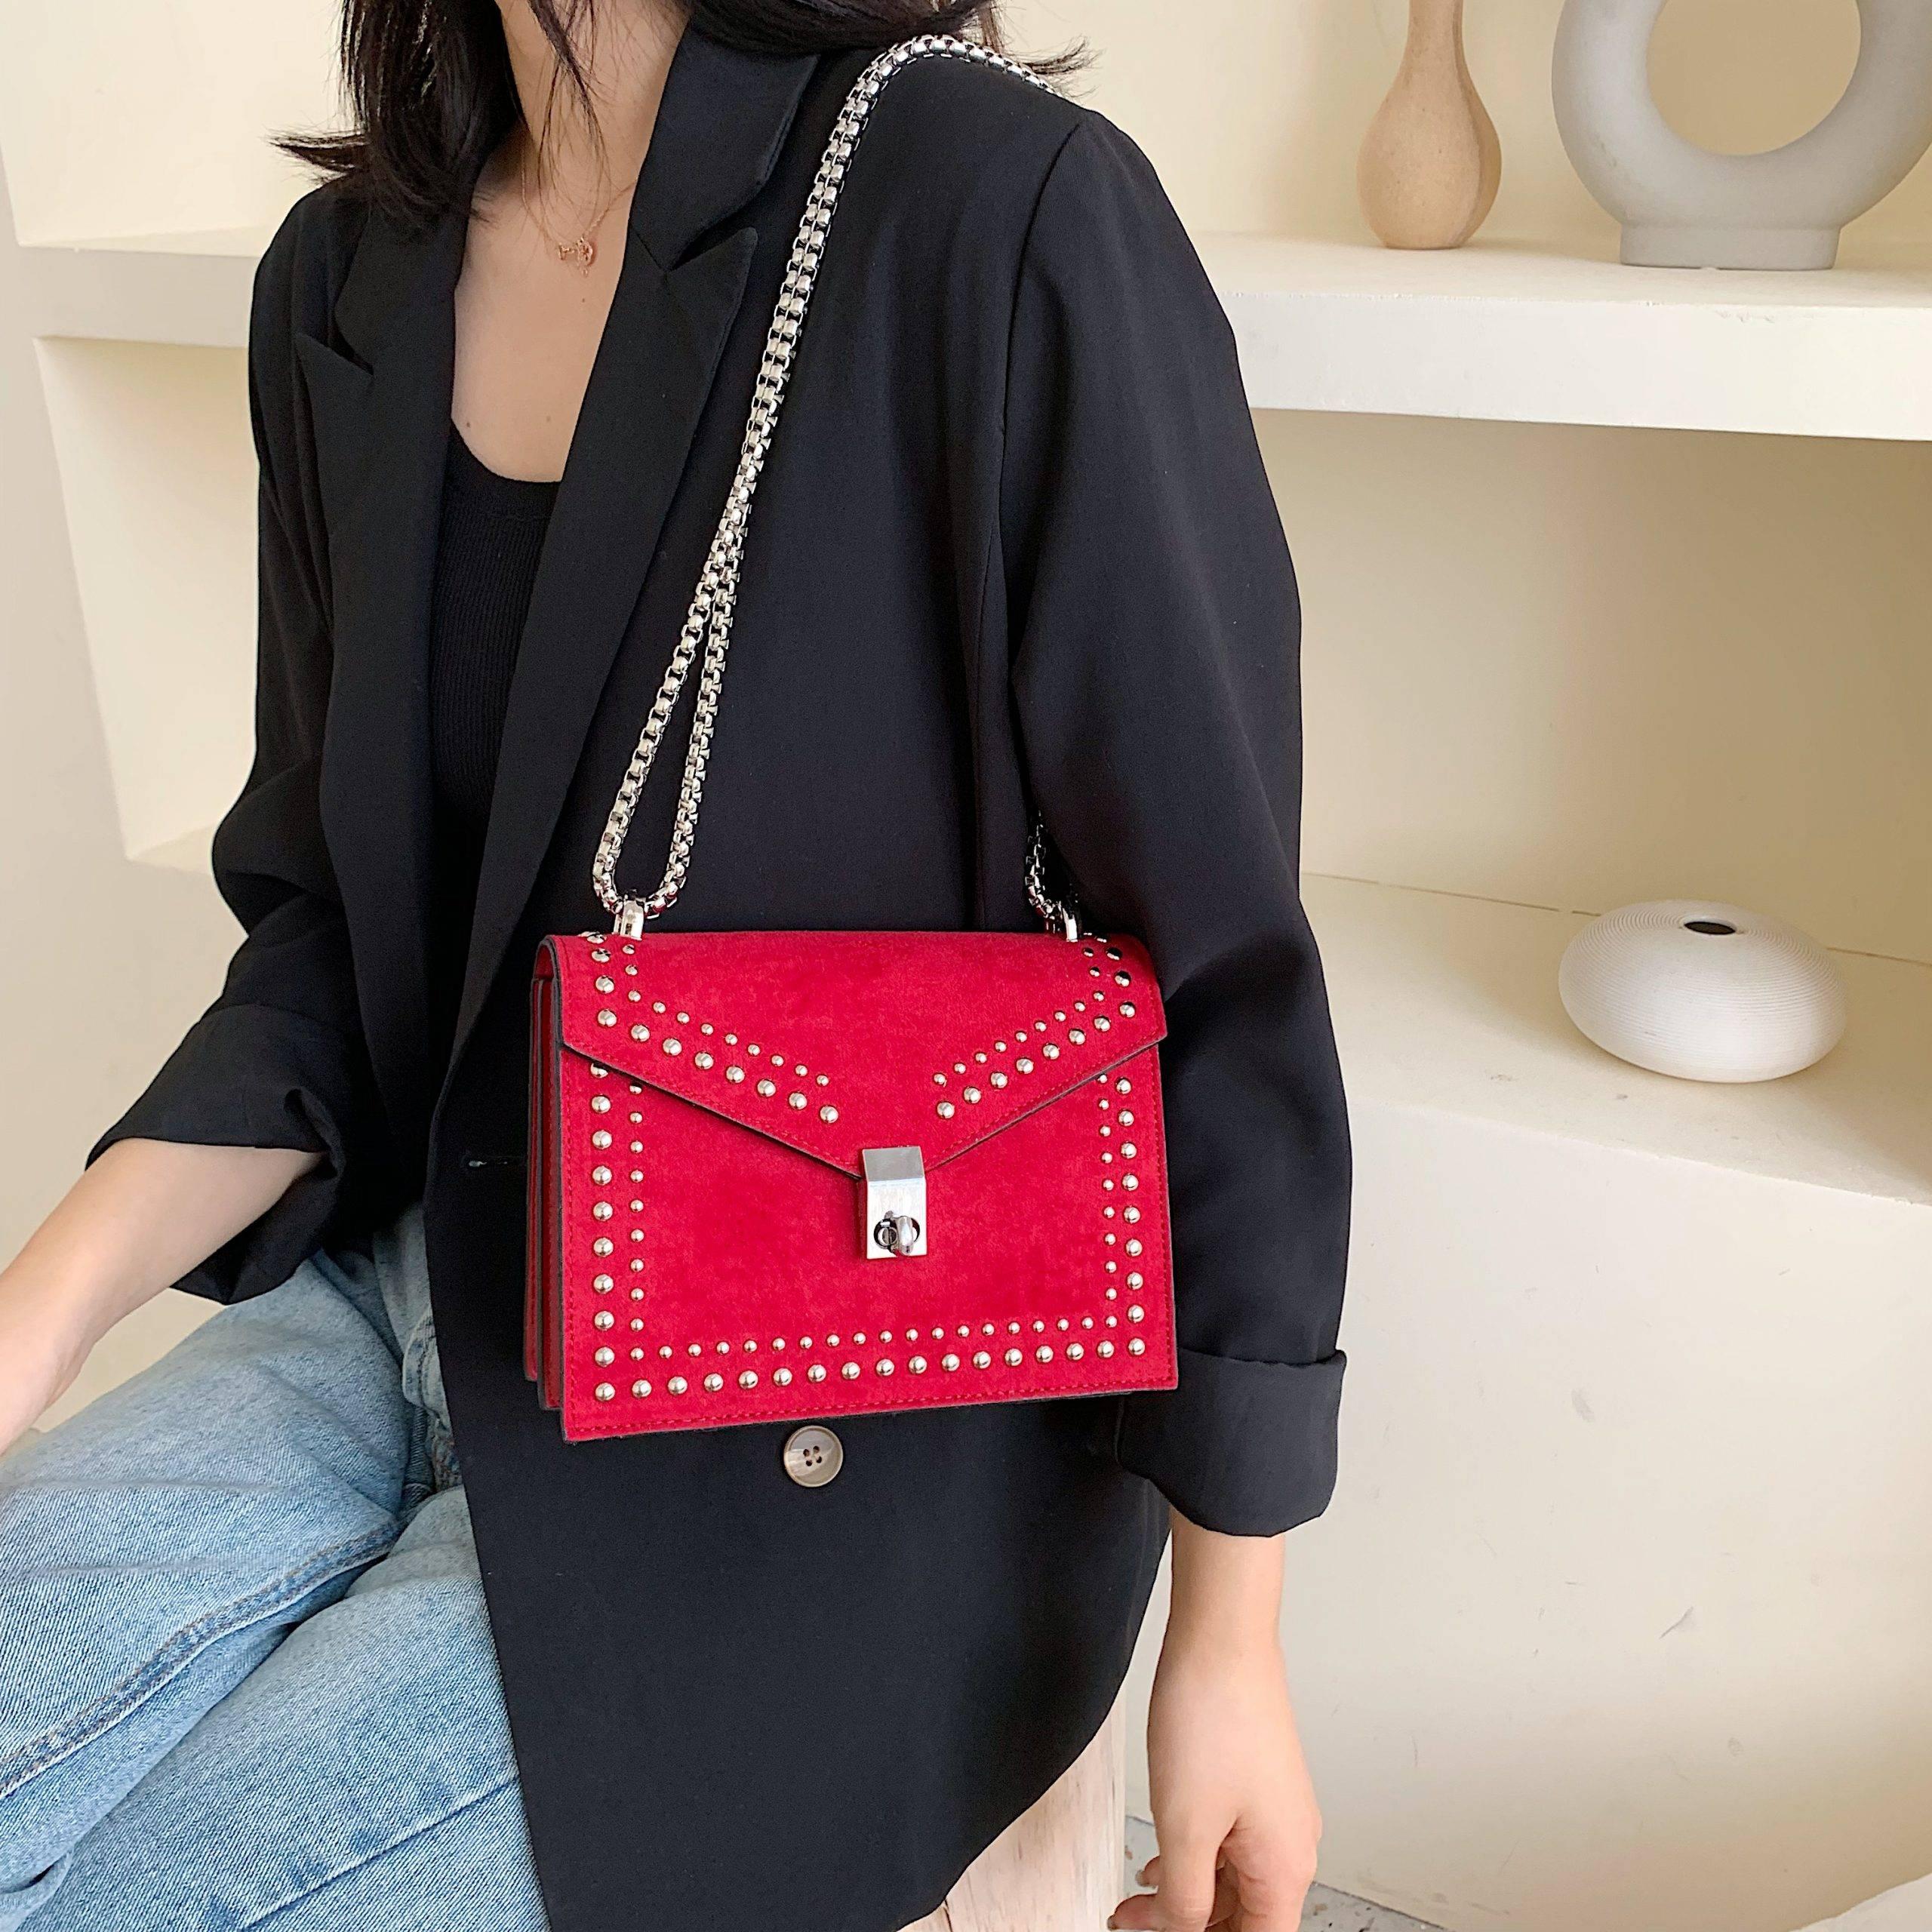 Women's Small Shoulder Messenger Bag Women Bags & Wallets cb5feb1b7314637725a2e7: Black|Blue Green|Khaki|Red